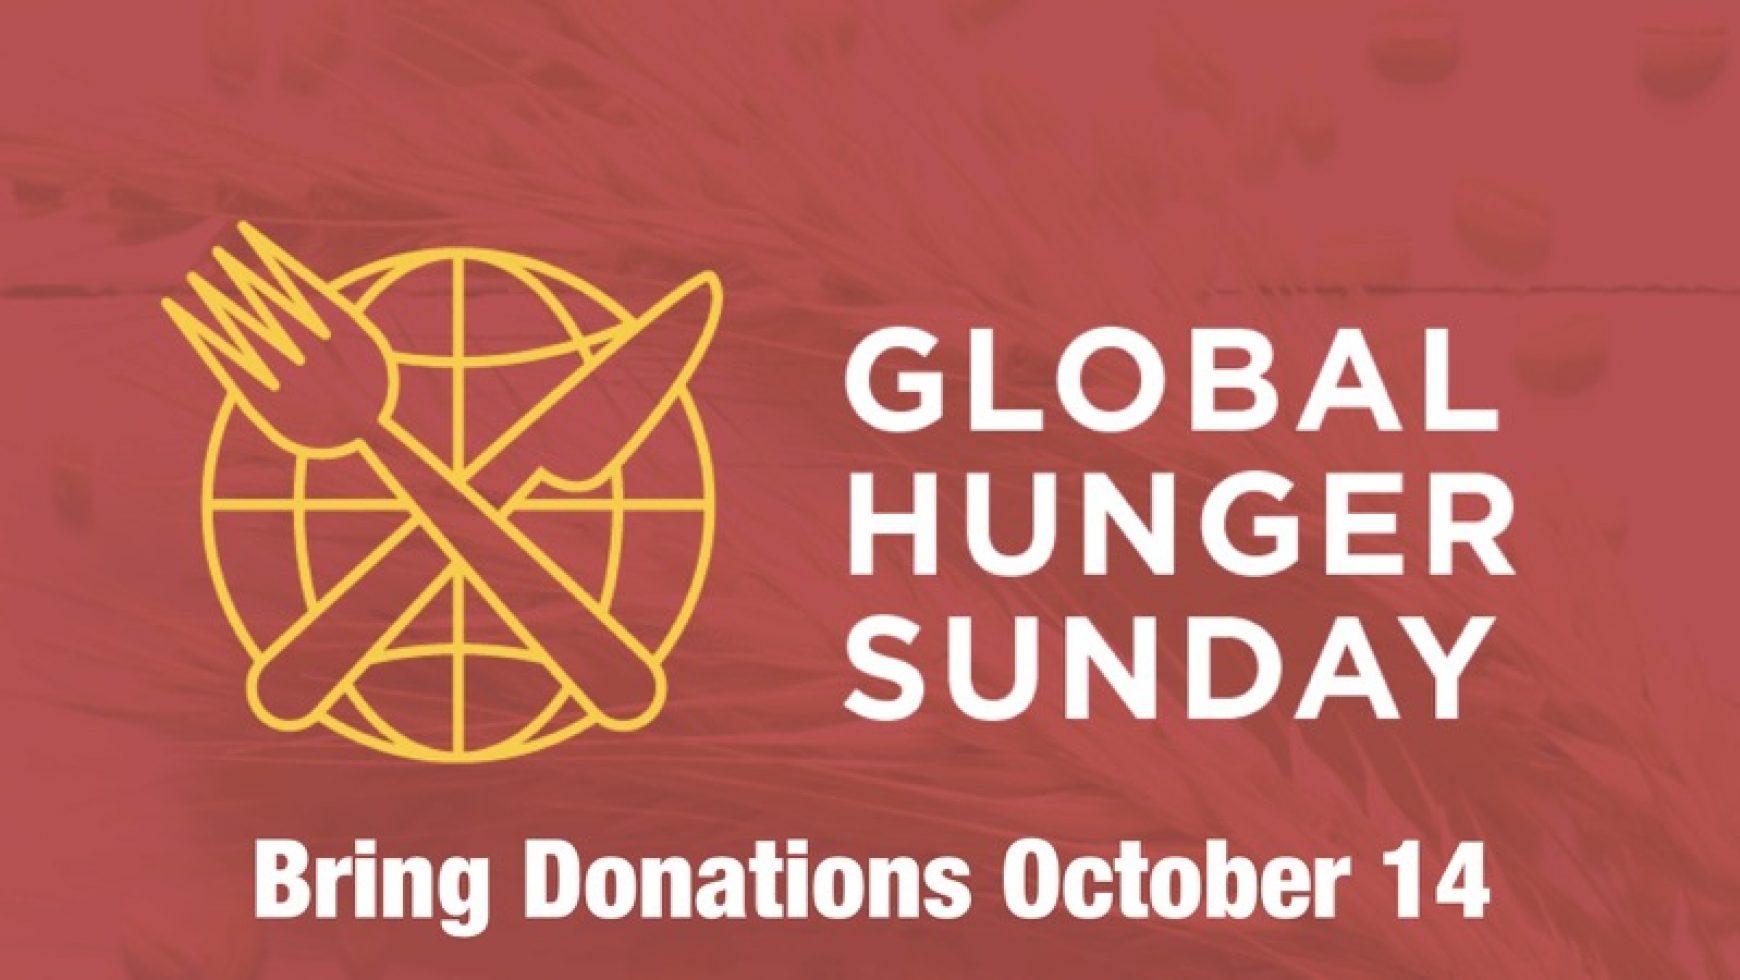 Global Hunger Sunday October 14